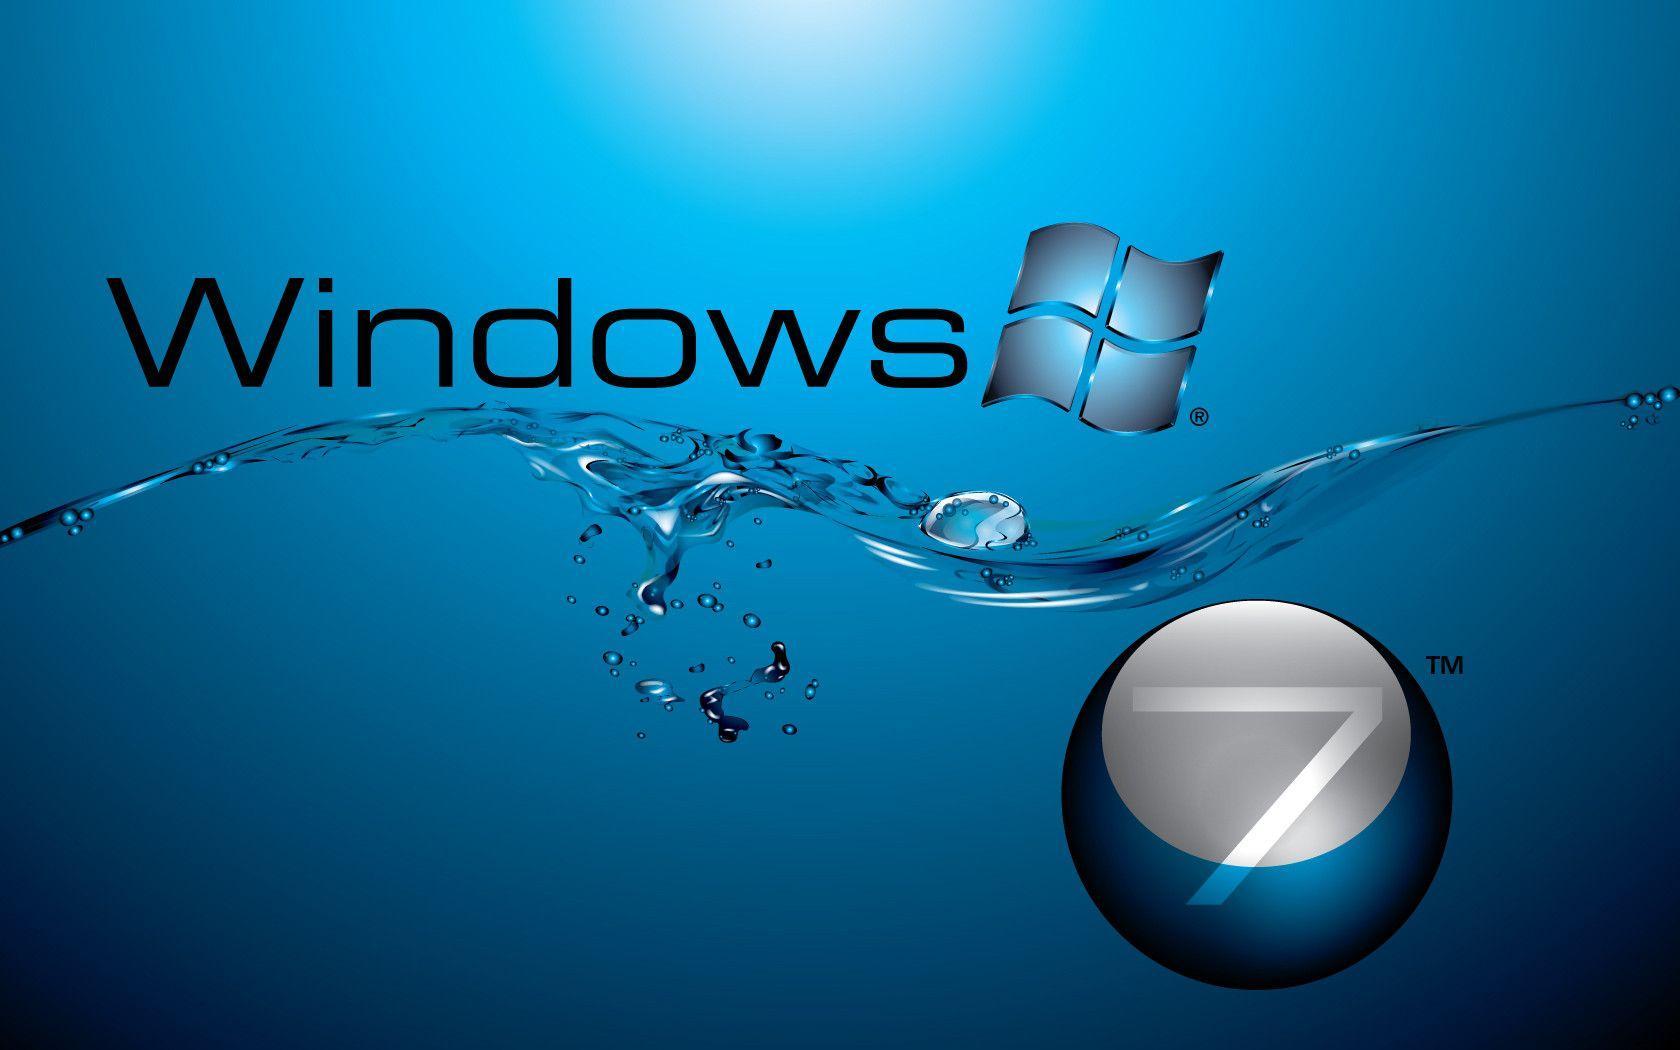 free desktop backgrounds for windows - wallpaper cave